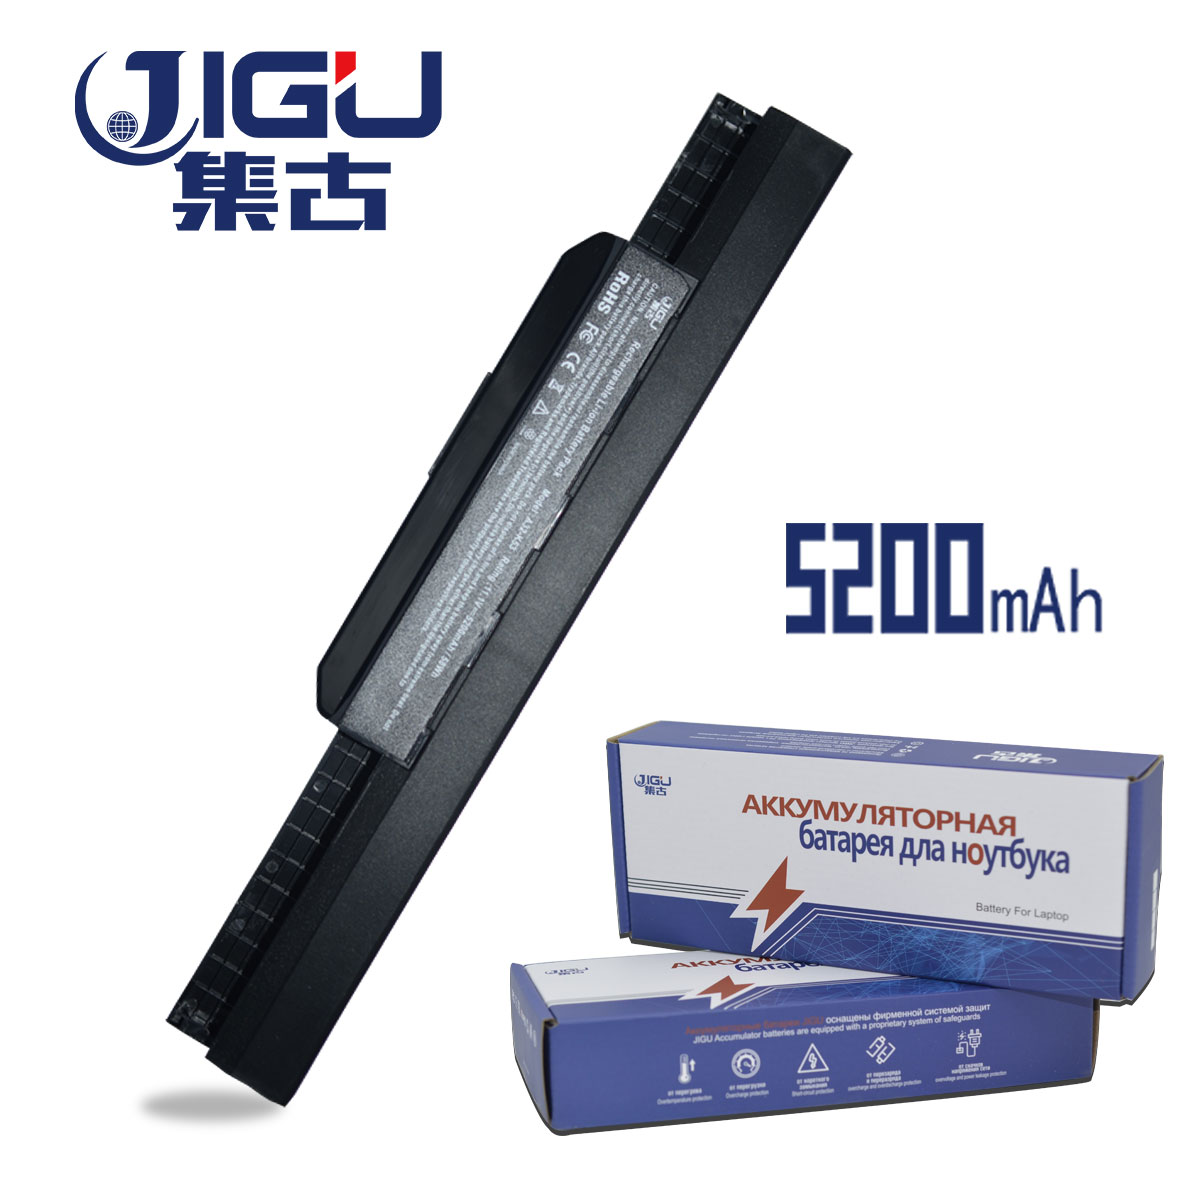 JIGU Laptop Battery A31-K53 A32-K53 A41-K53 A42-K53 For Asus x53s A43 A53s K43 K53 k53s k53U X43 A43B A53B K53B X43B Series laptop battery for asus a43 a53 k43 k53 x43 a43b a53b k43b k53b x43b k53b k53e k53f k53j k53s k53s e k53u series a32 k53 a42 k53